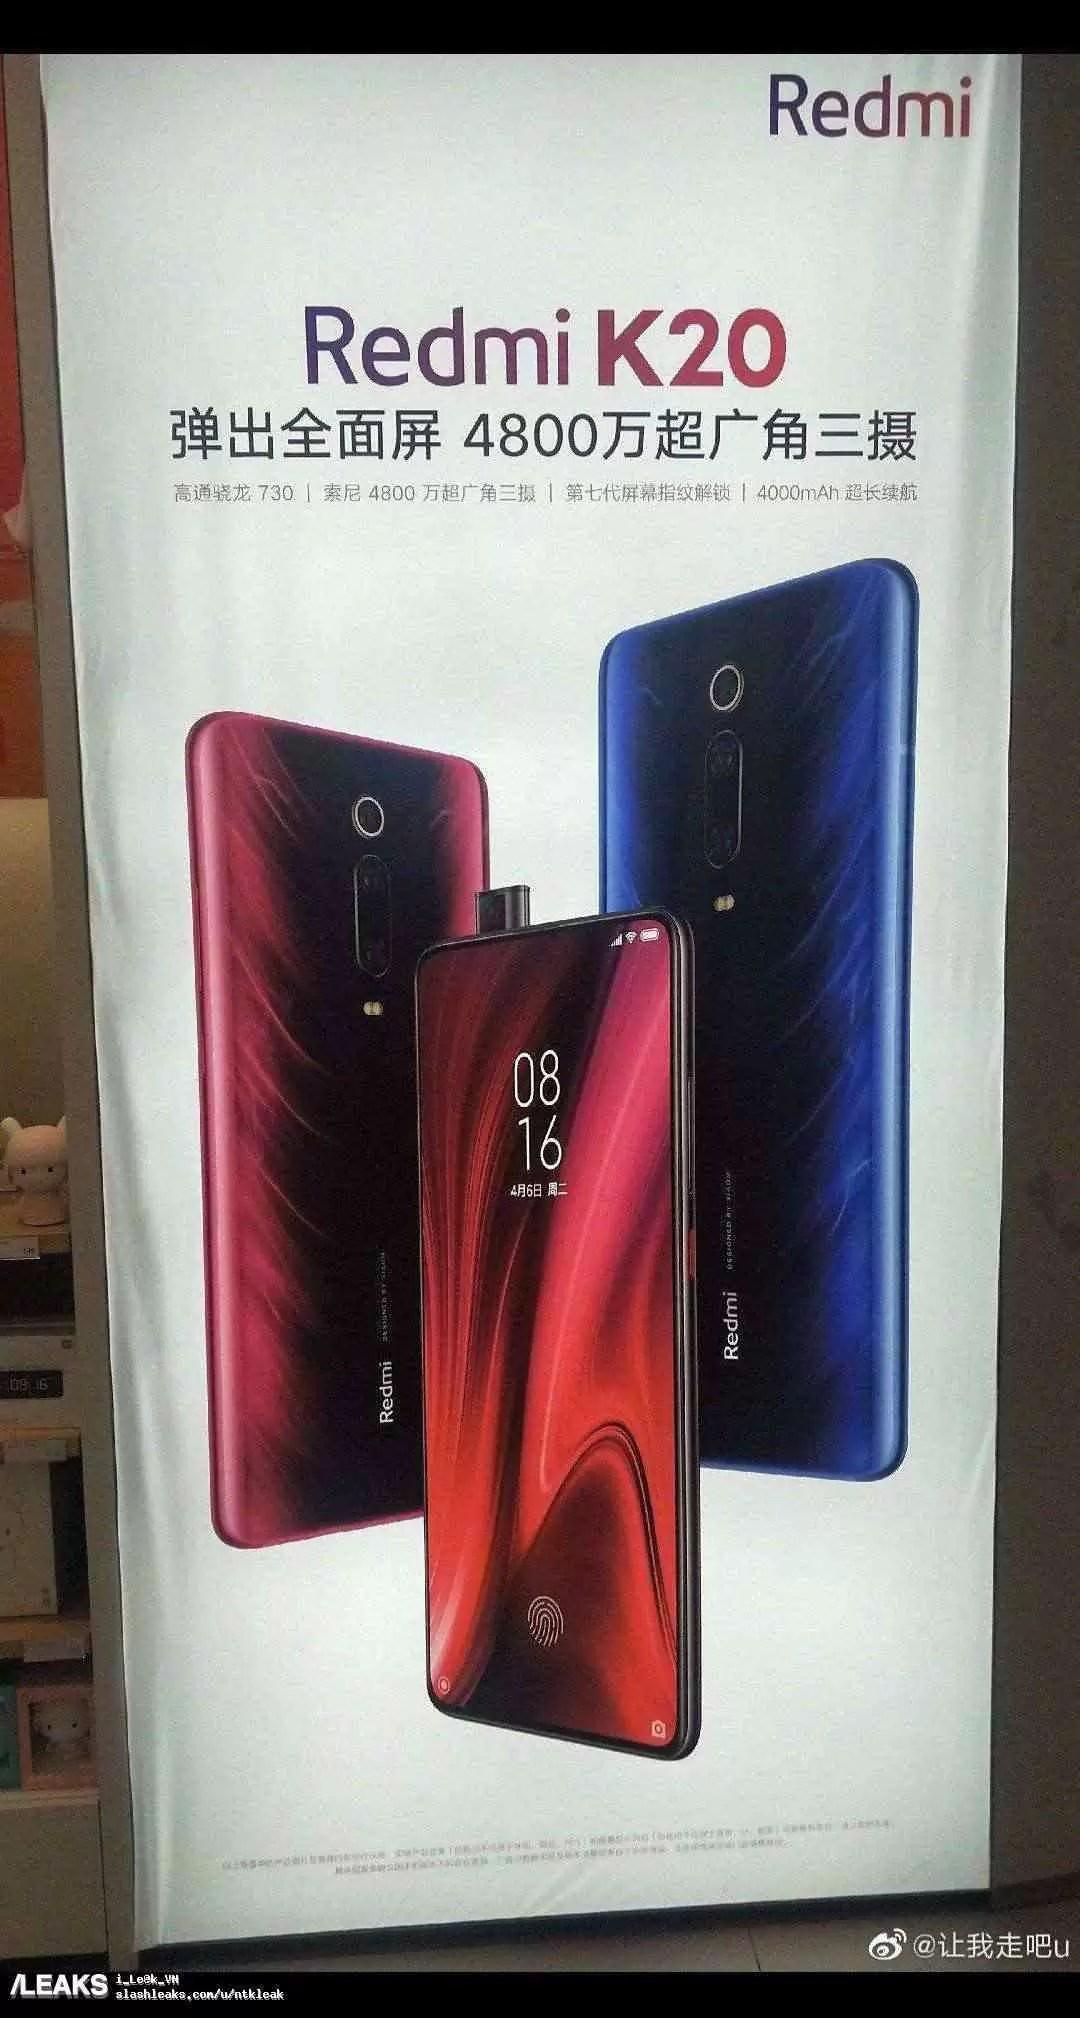 img Redmi K20 Snapdragon 730 poster